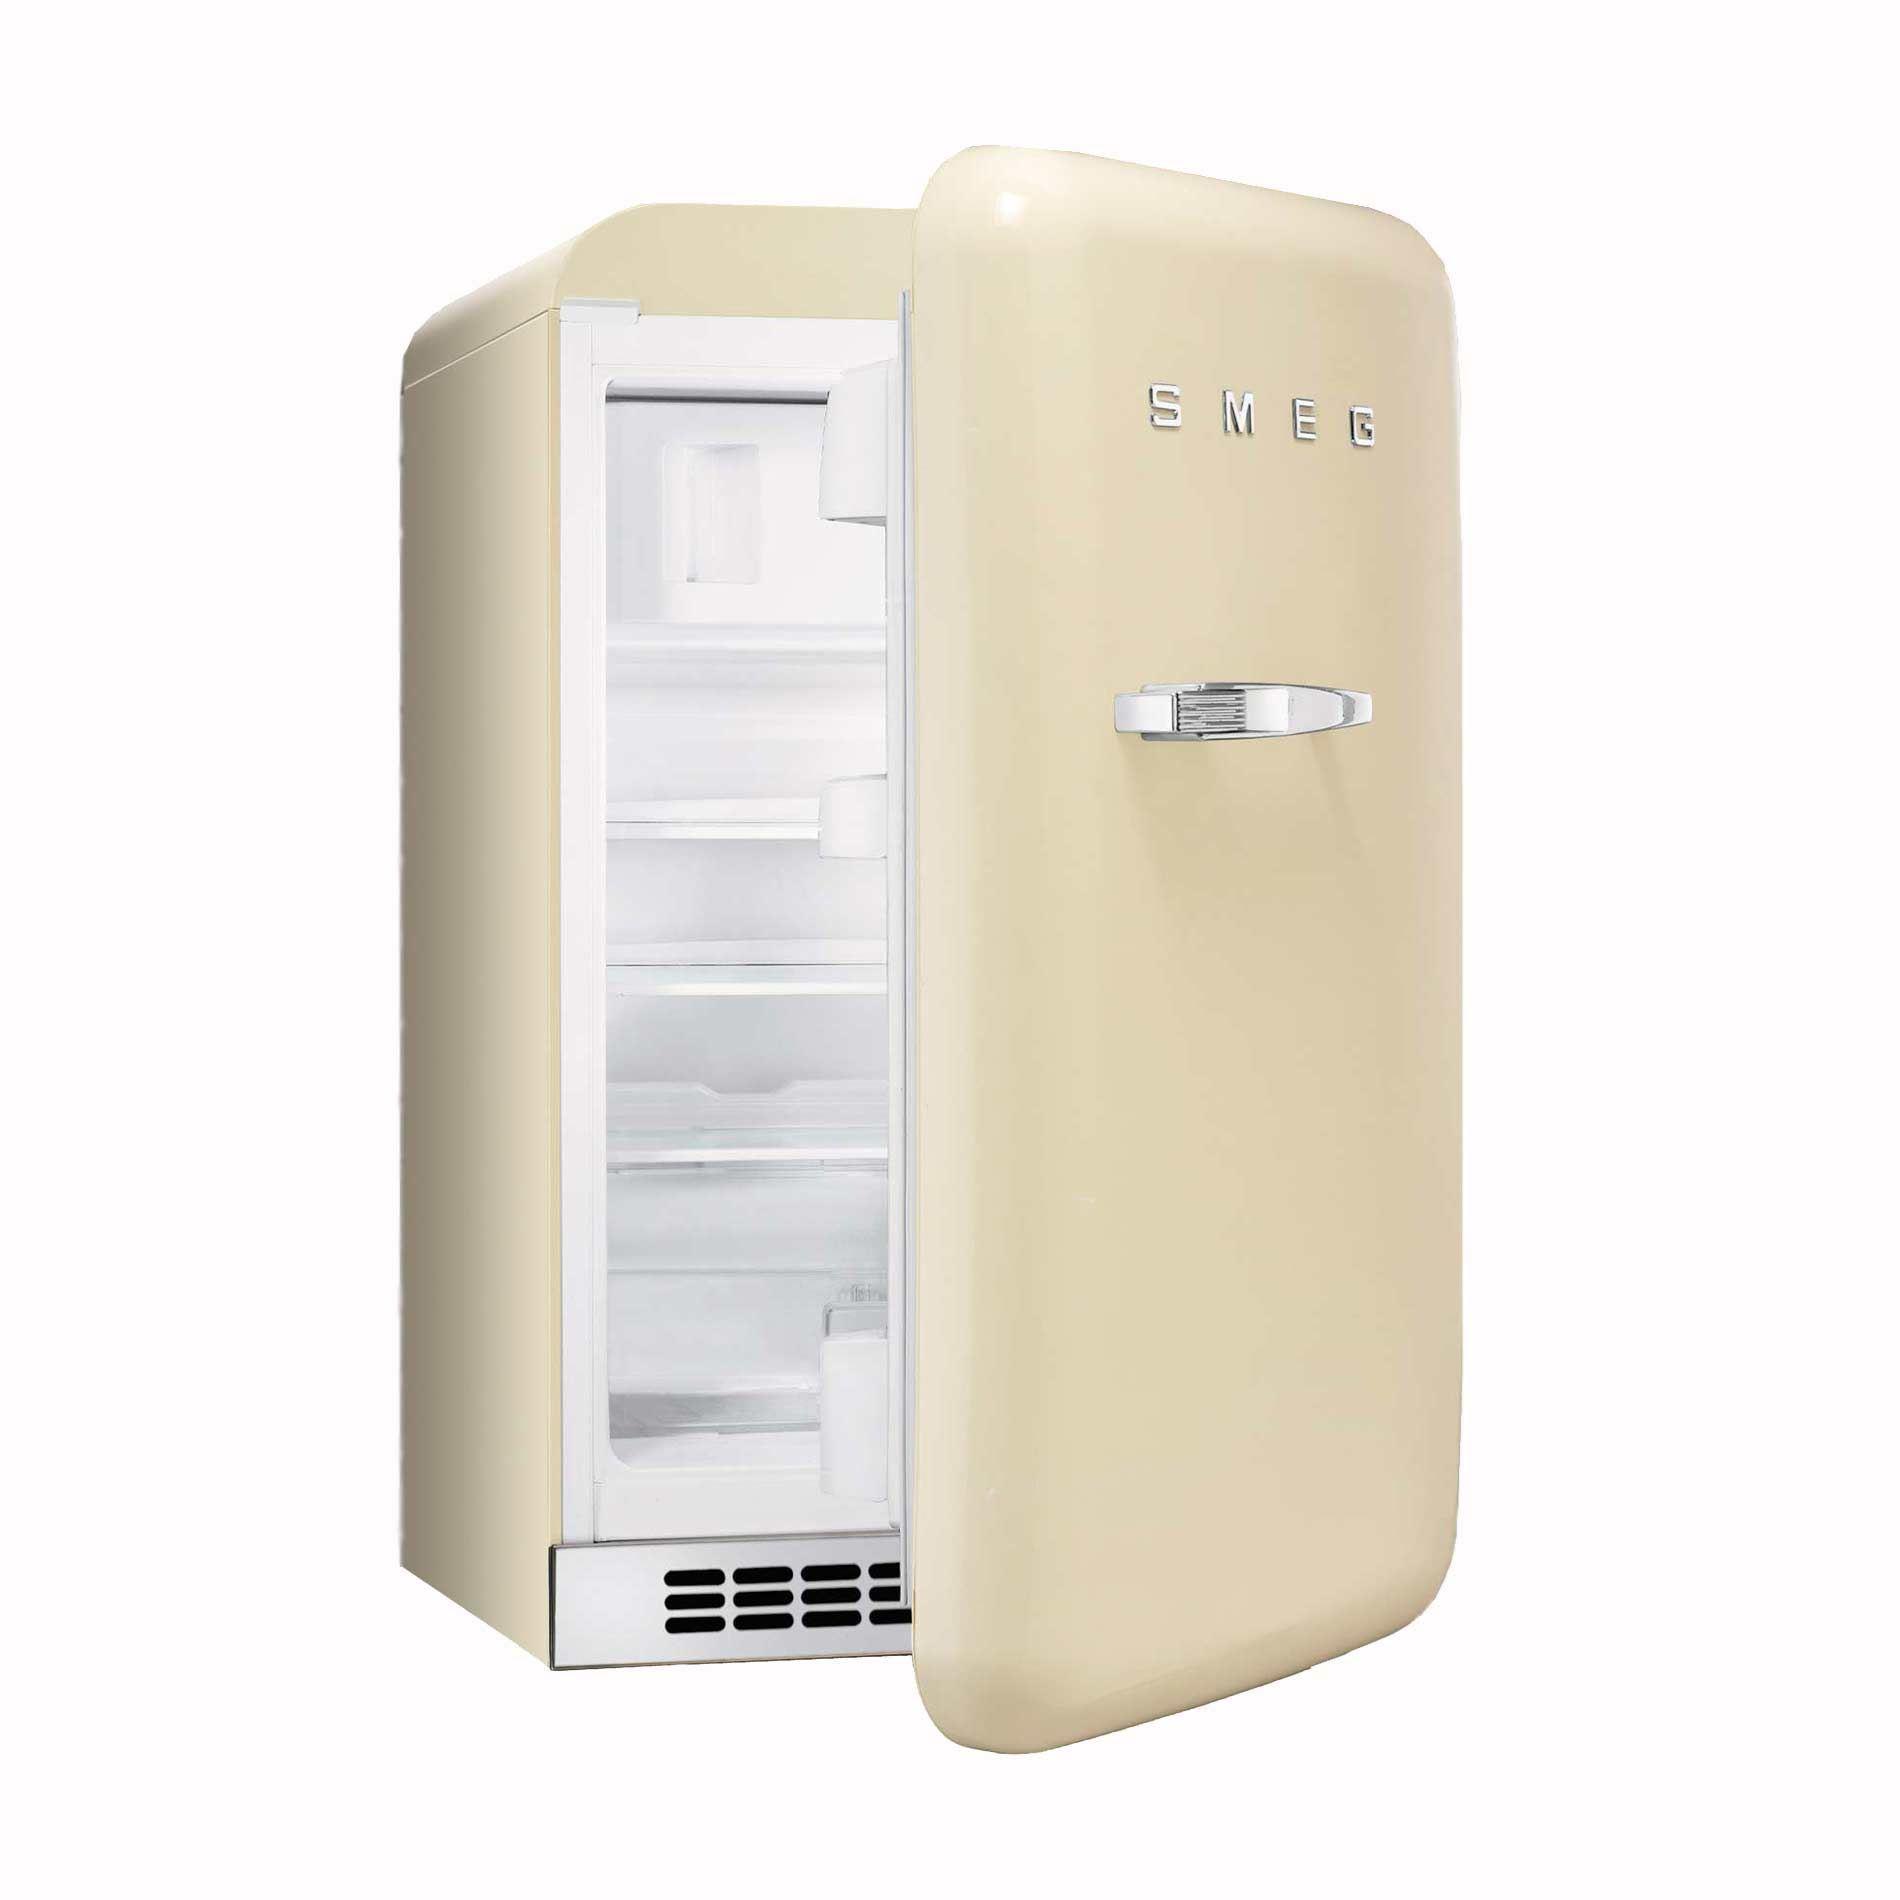 50s Style Kitchen Appliances Smeg Fab10rp 55cm Cream Small 50s Style Fridge With Icebox